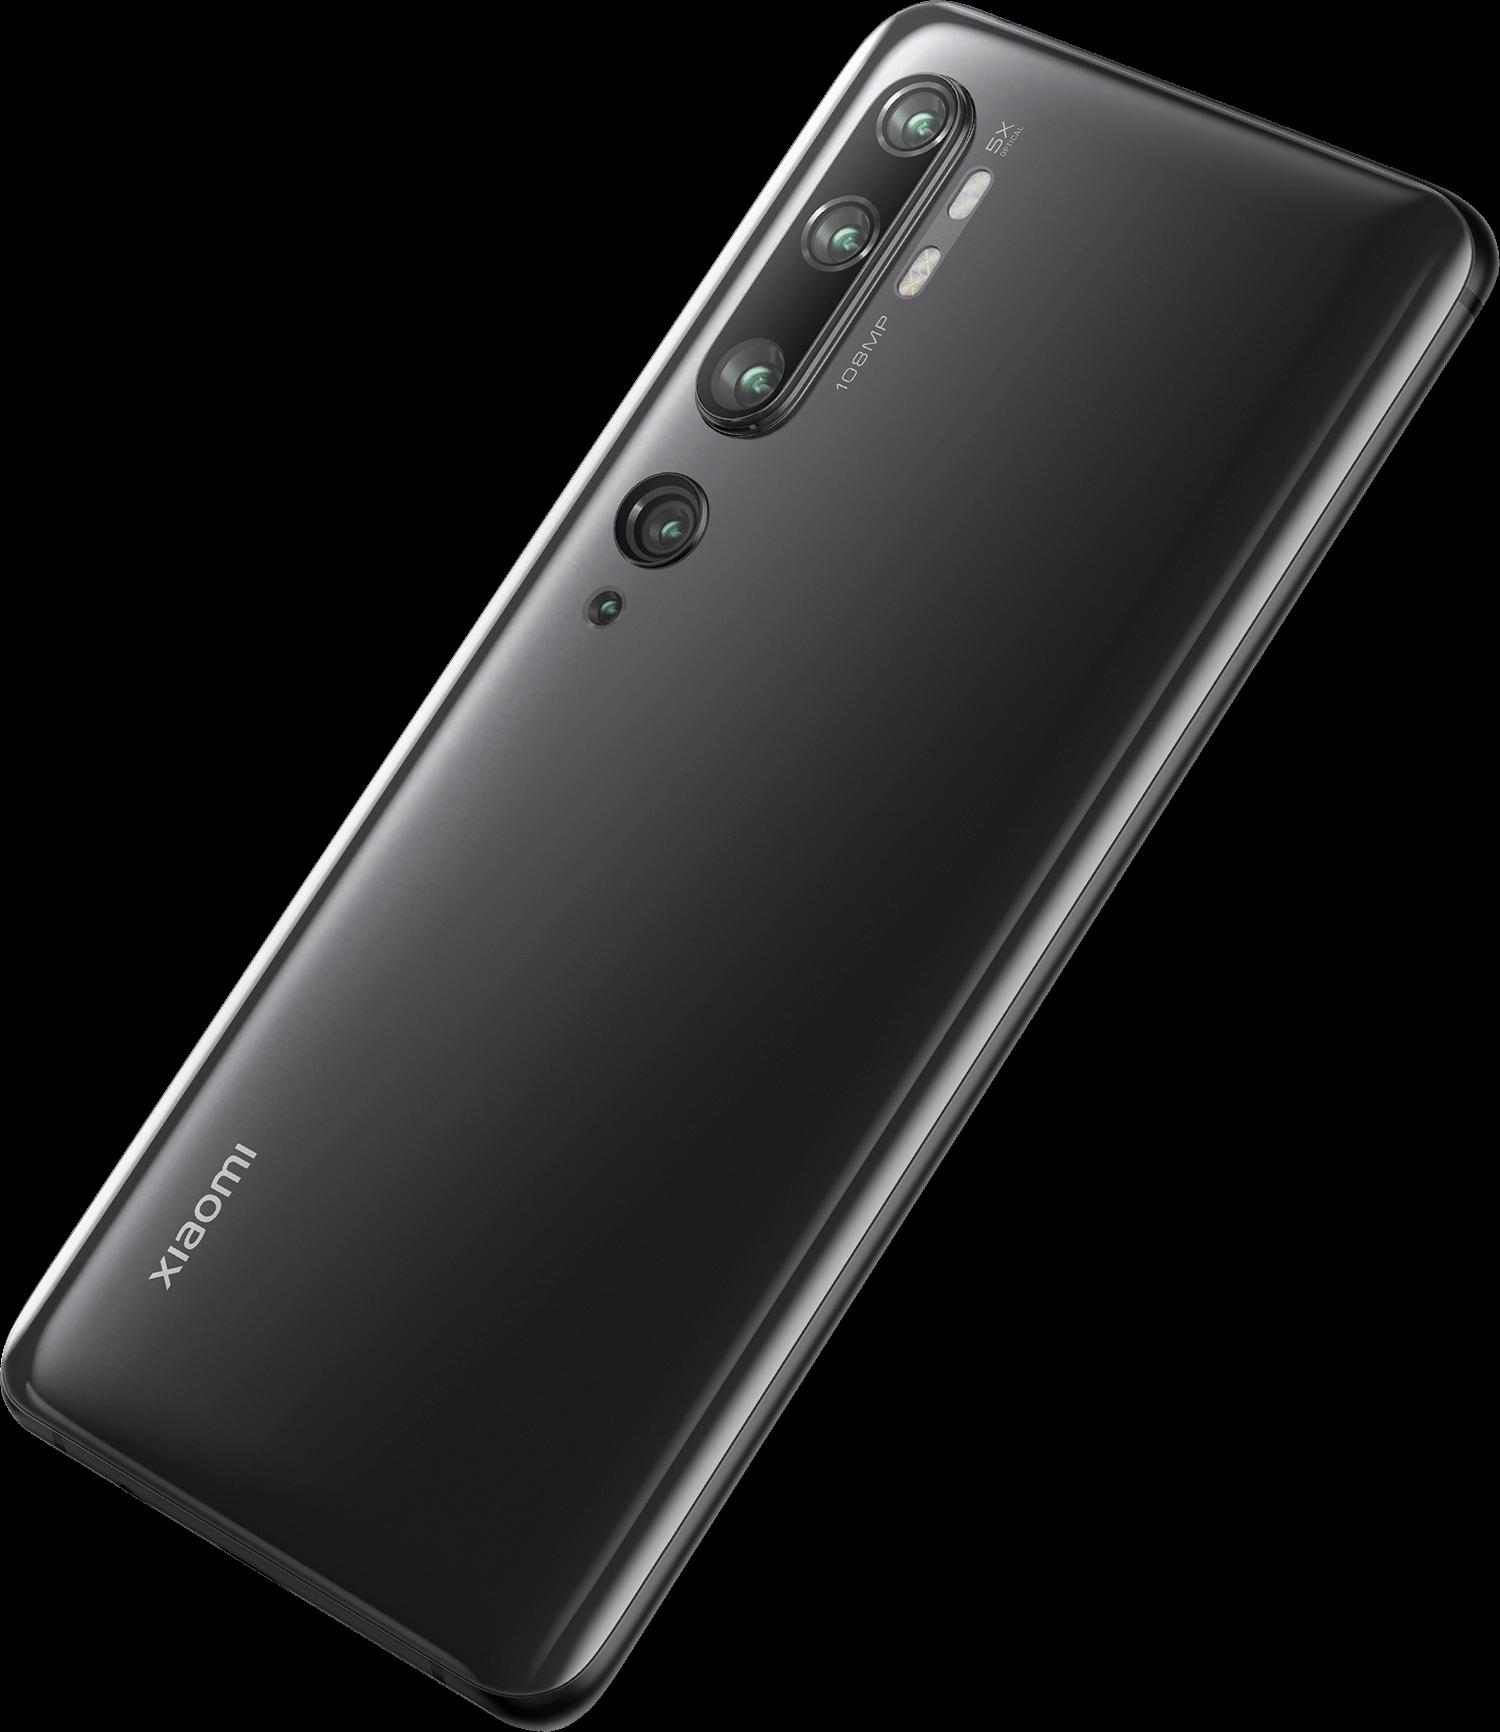 Grab Xiaomi Mi 10 Ultra from GizTop Europe warehouse with ...  |Xiaomi Mi 10 Ultra